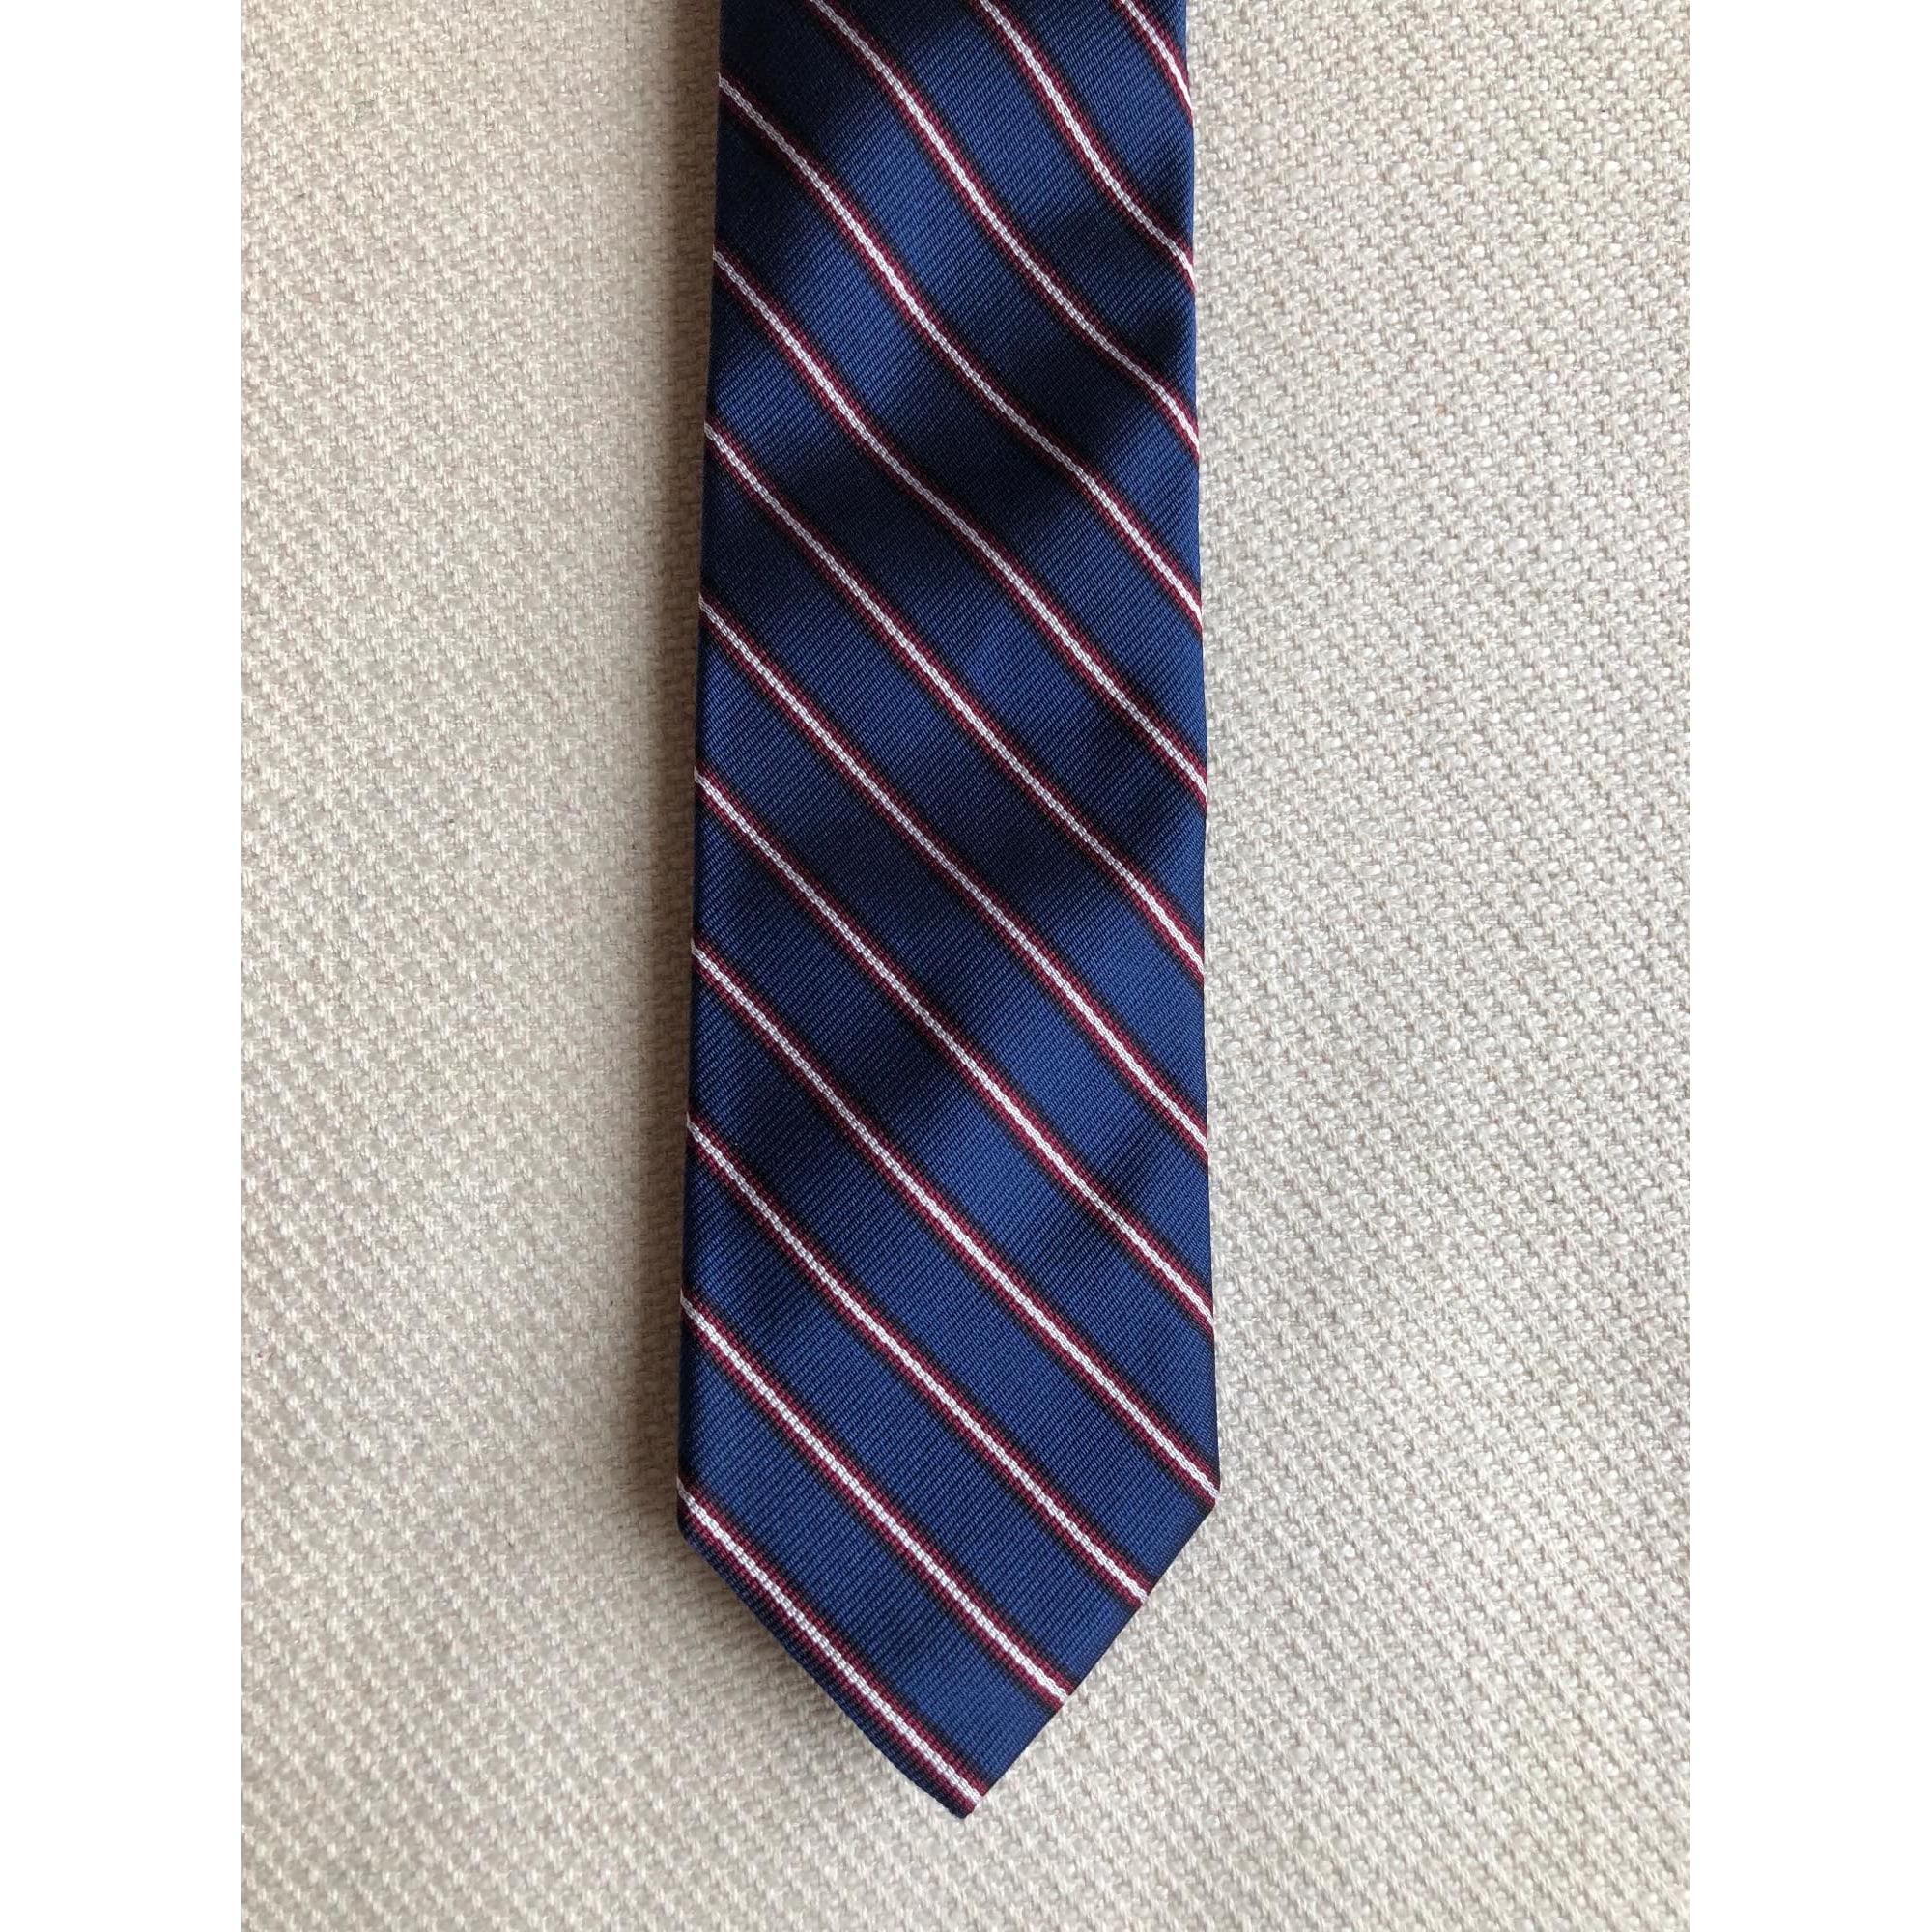 Cravate J CREW Bleu, bleu marine, bleu turquoise